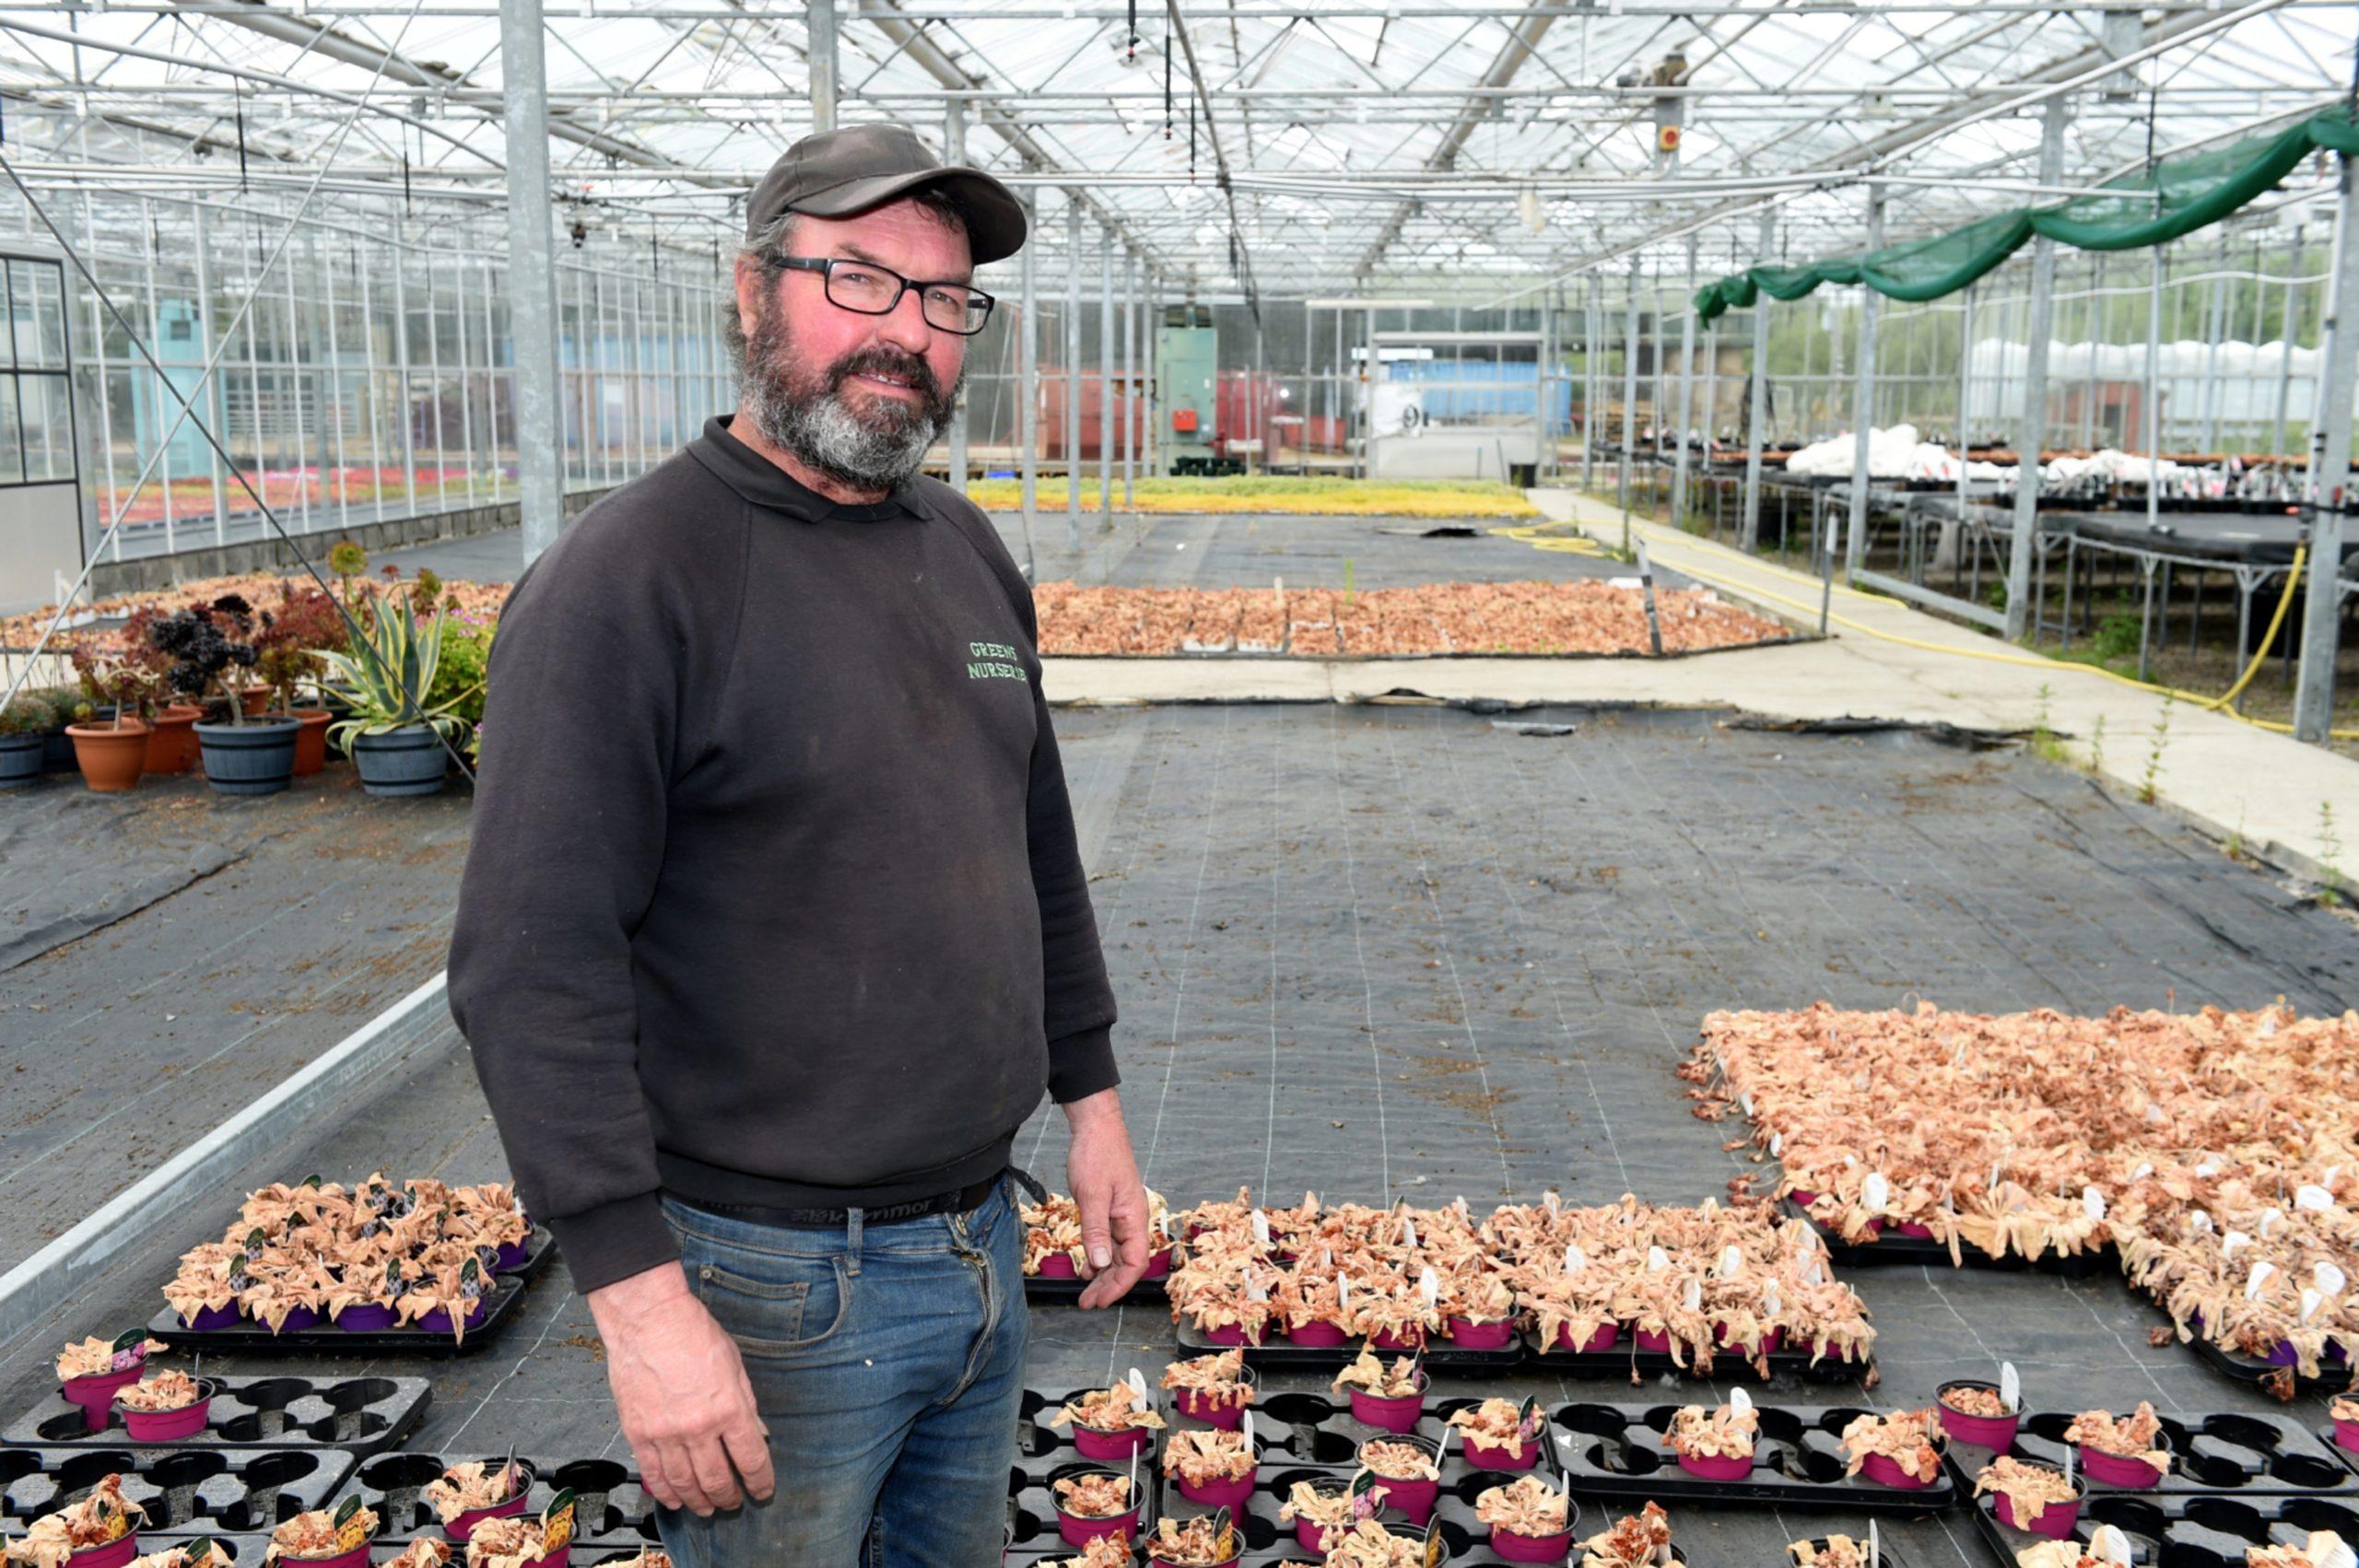 Donald Green estimates his business has lost £1m.